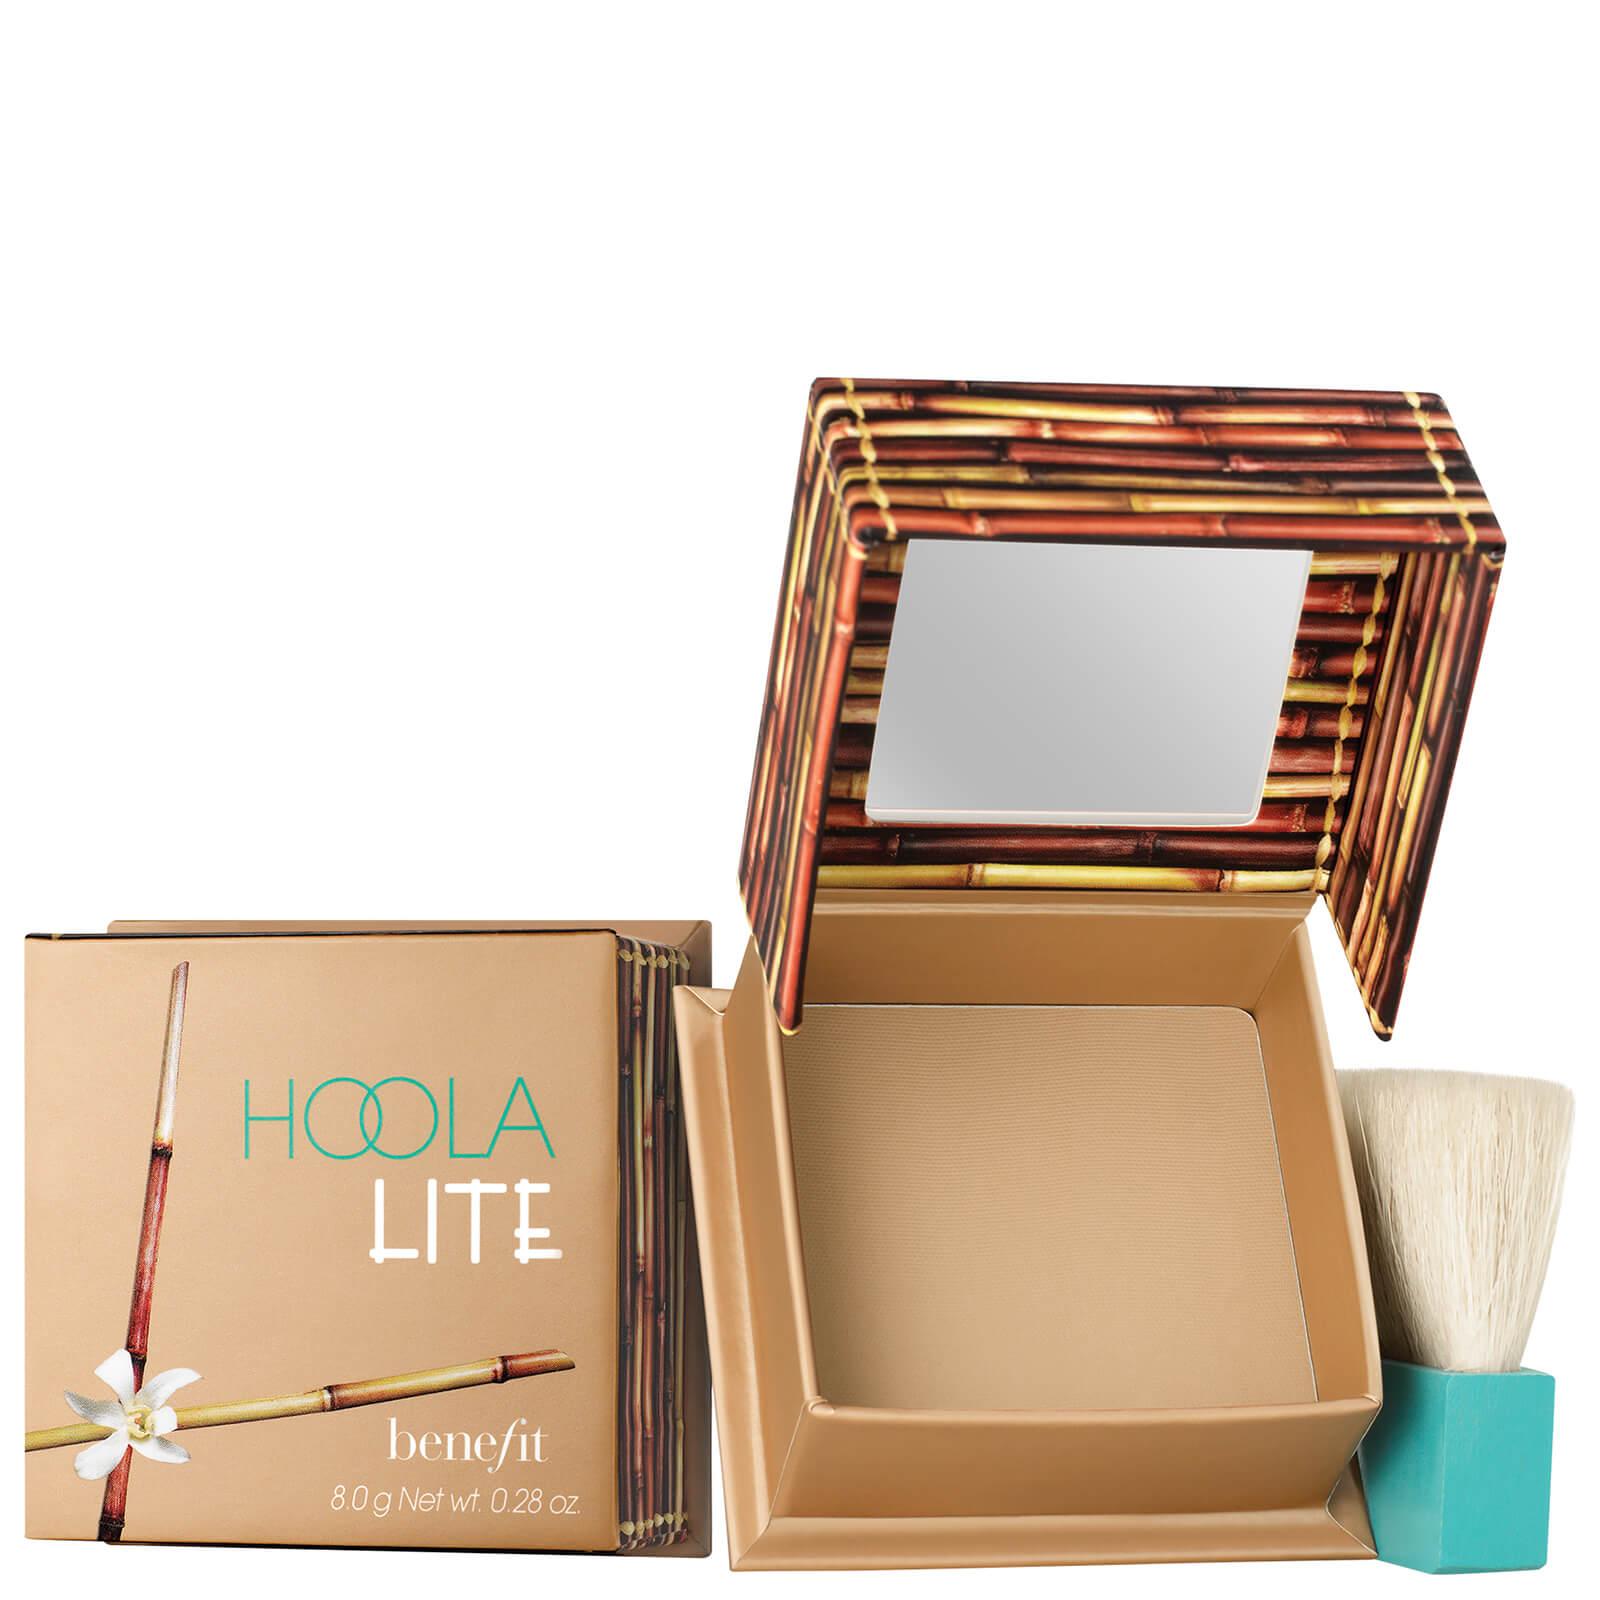 bd17d460938 benefit Hoola Lite Powder Bronzer | Free Shipping | Lookfantastic